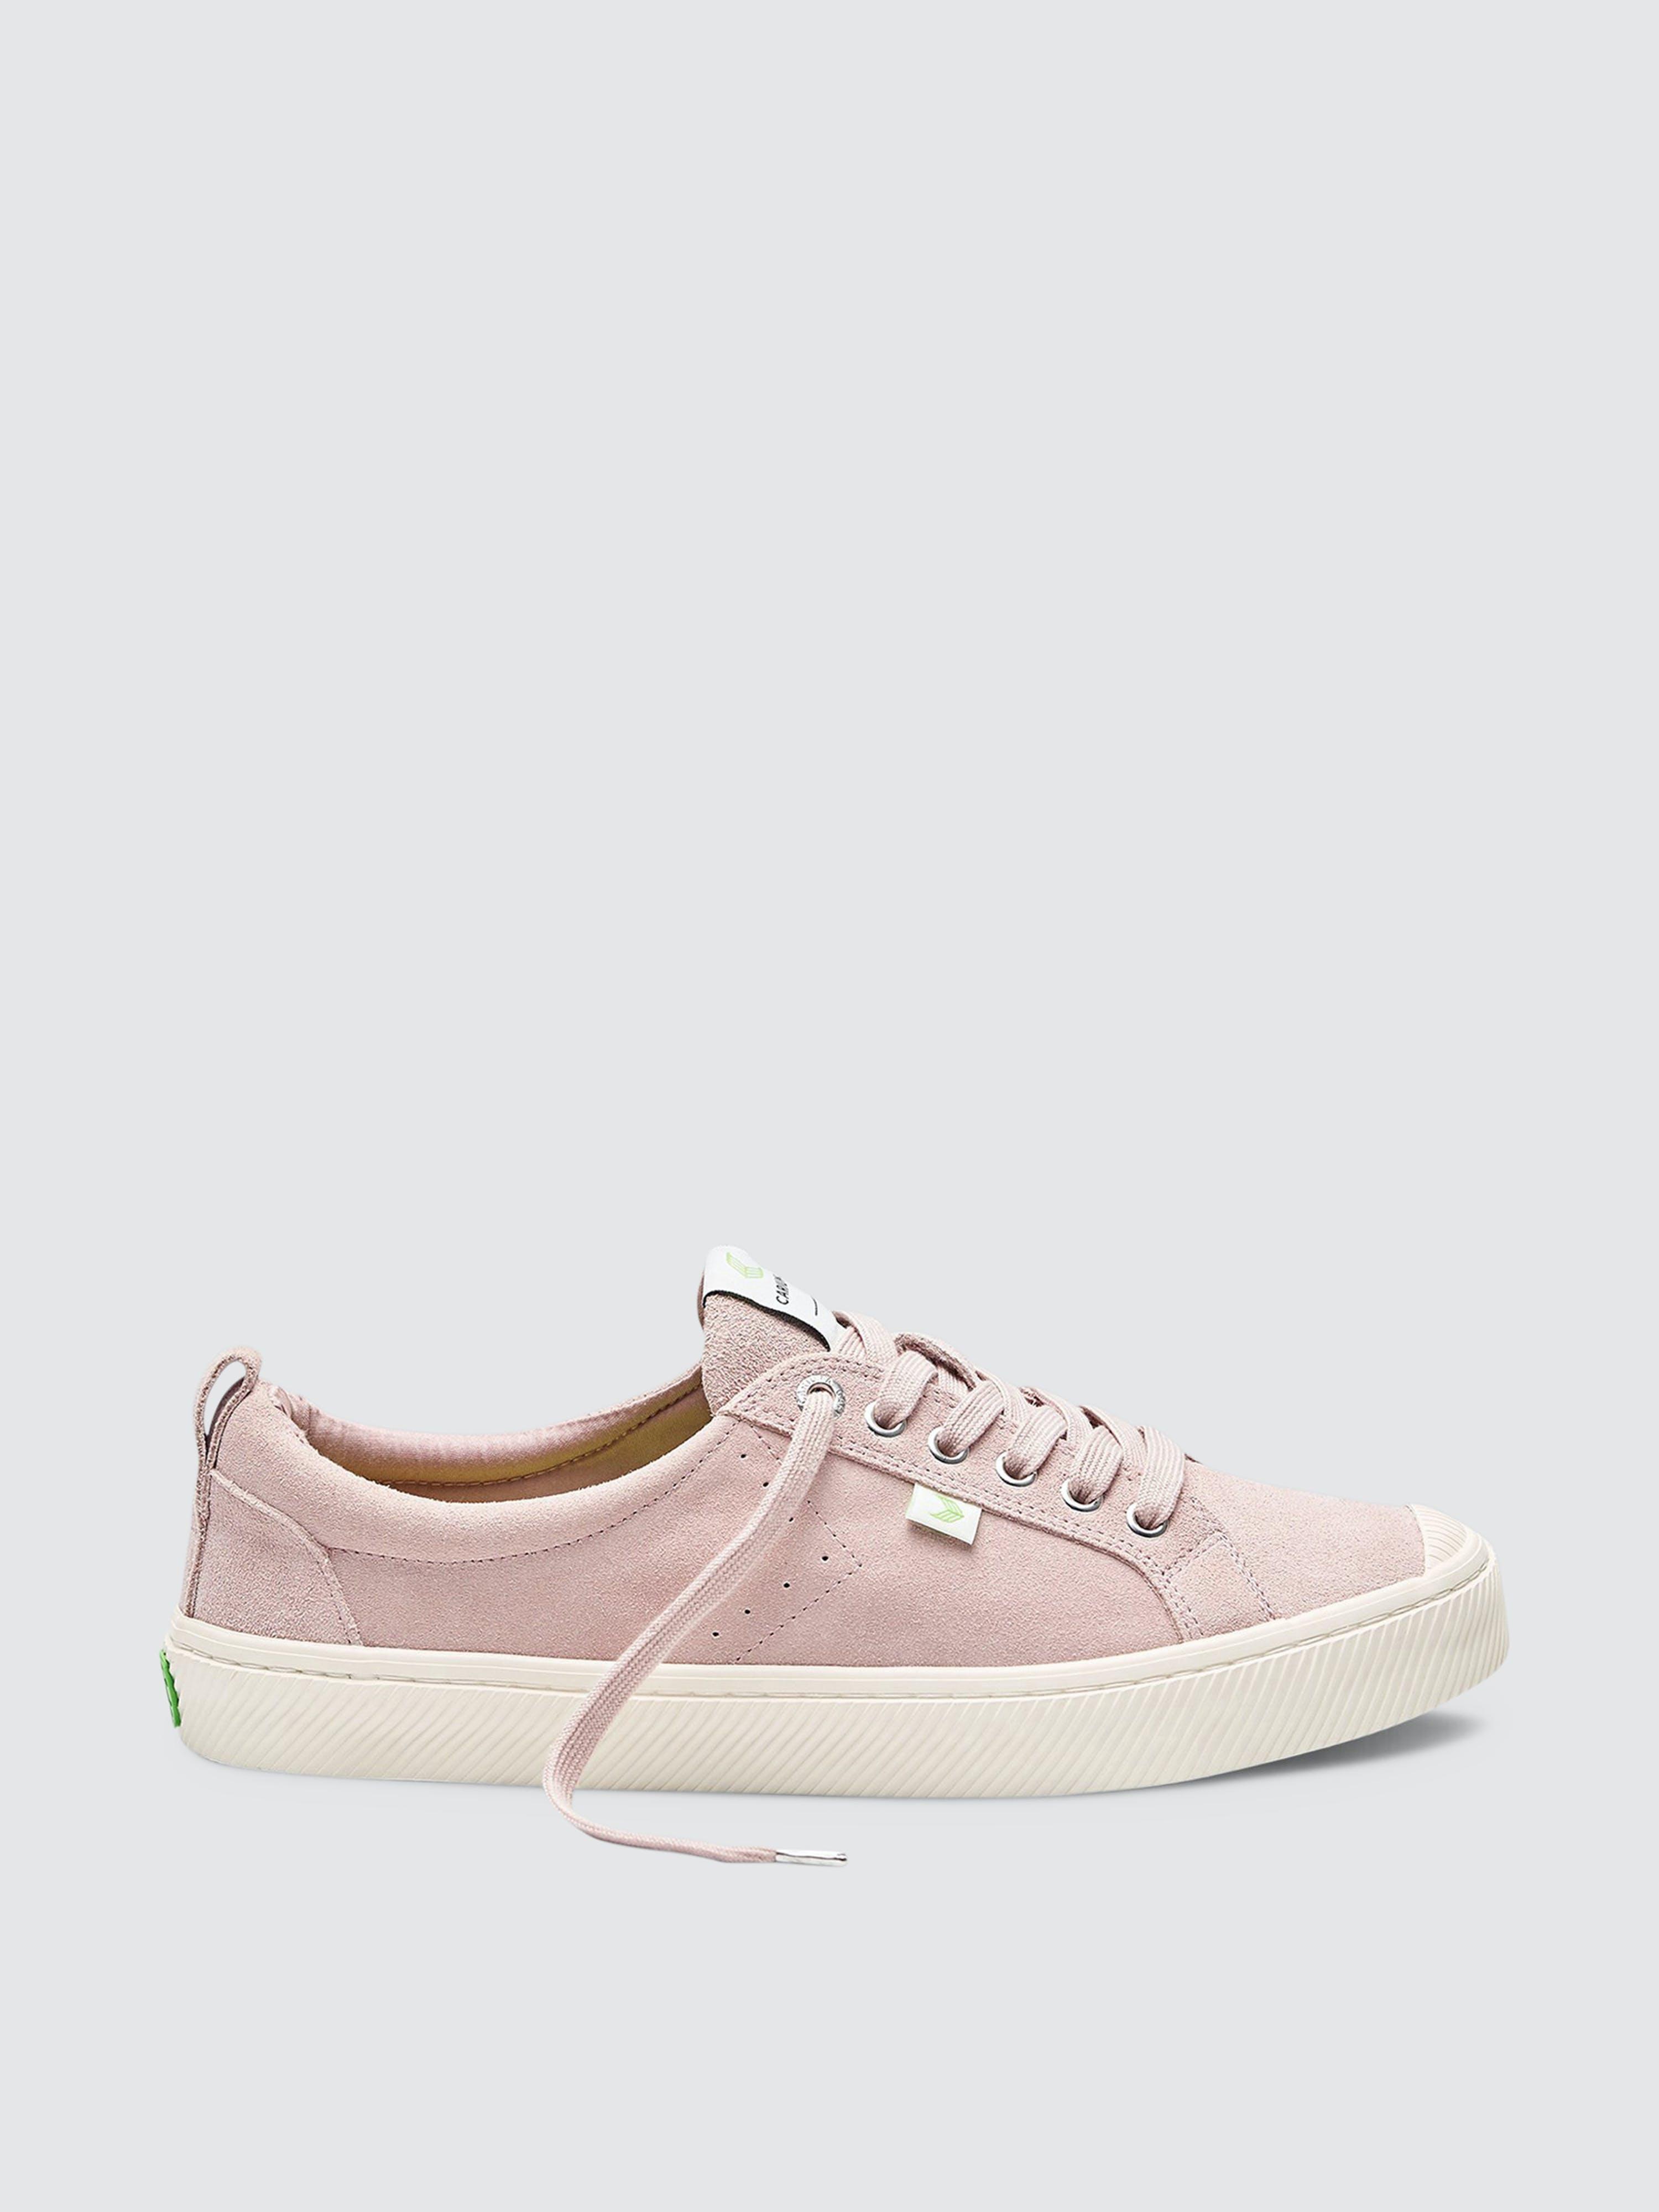 Cariuma Oca Low Rose Suede Sneaker Women In Pink